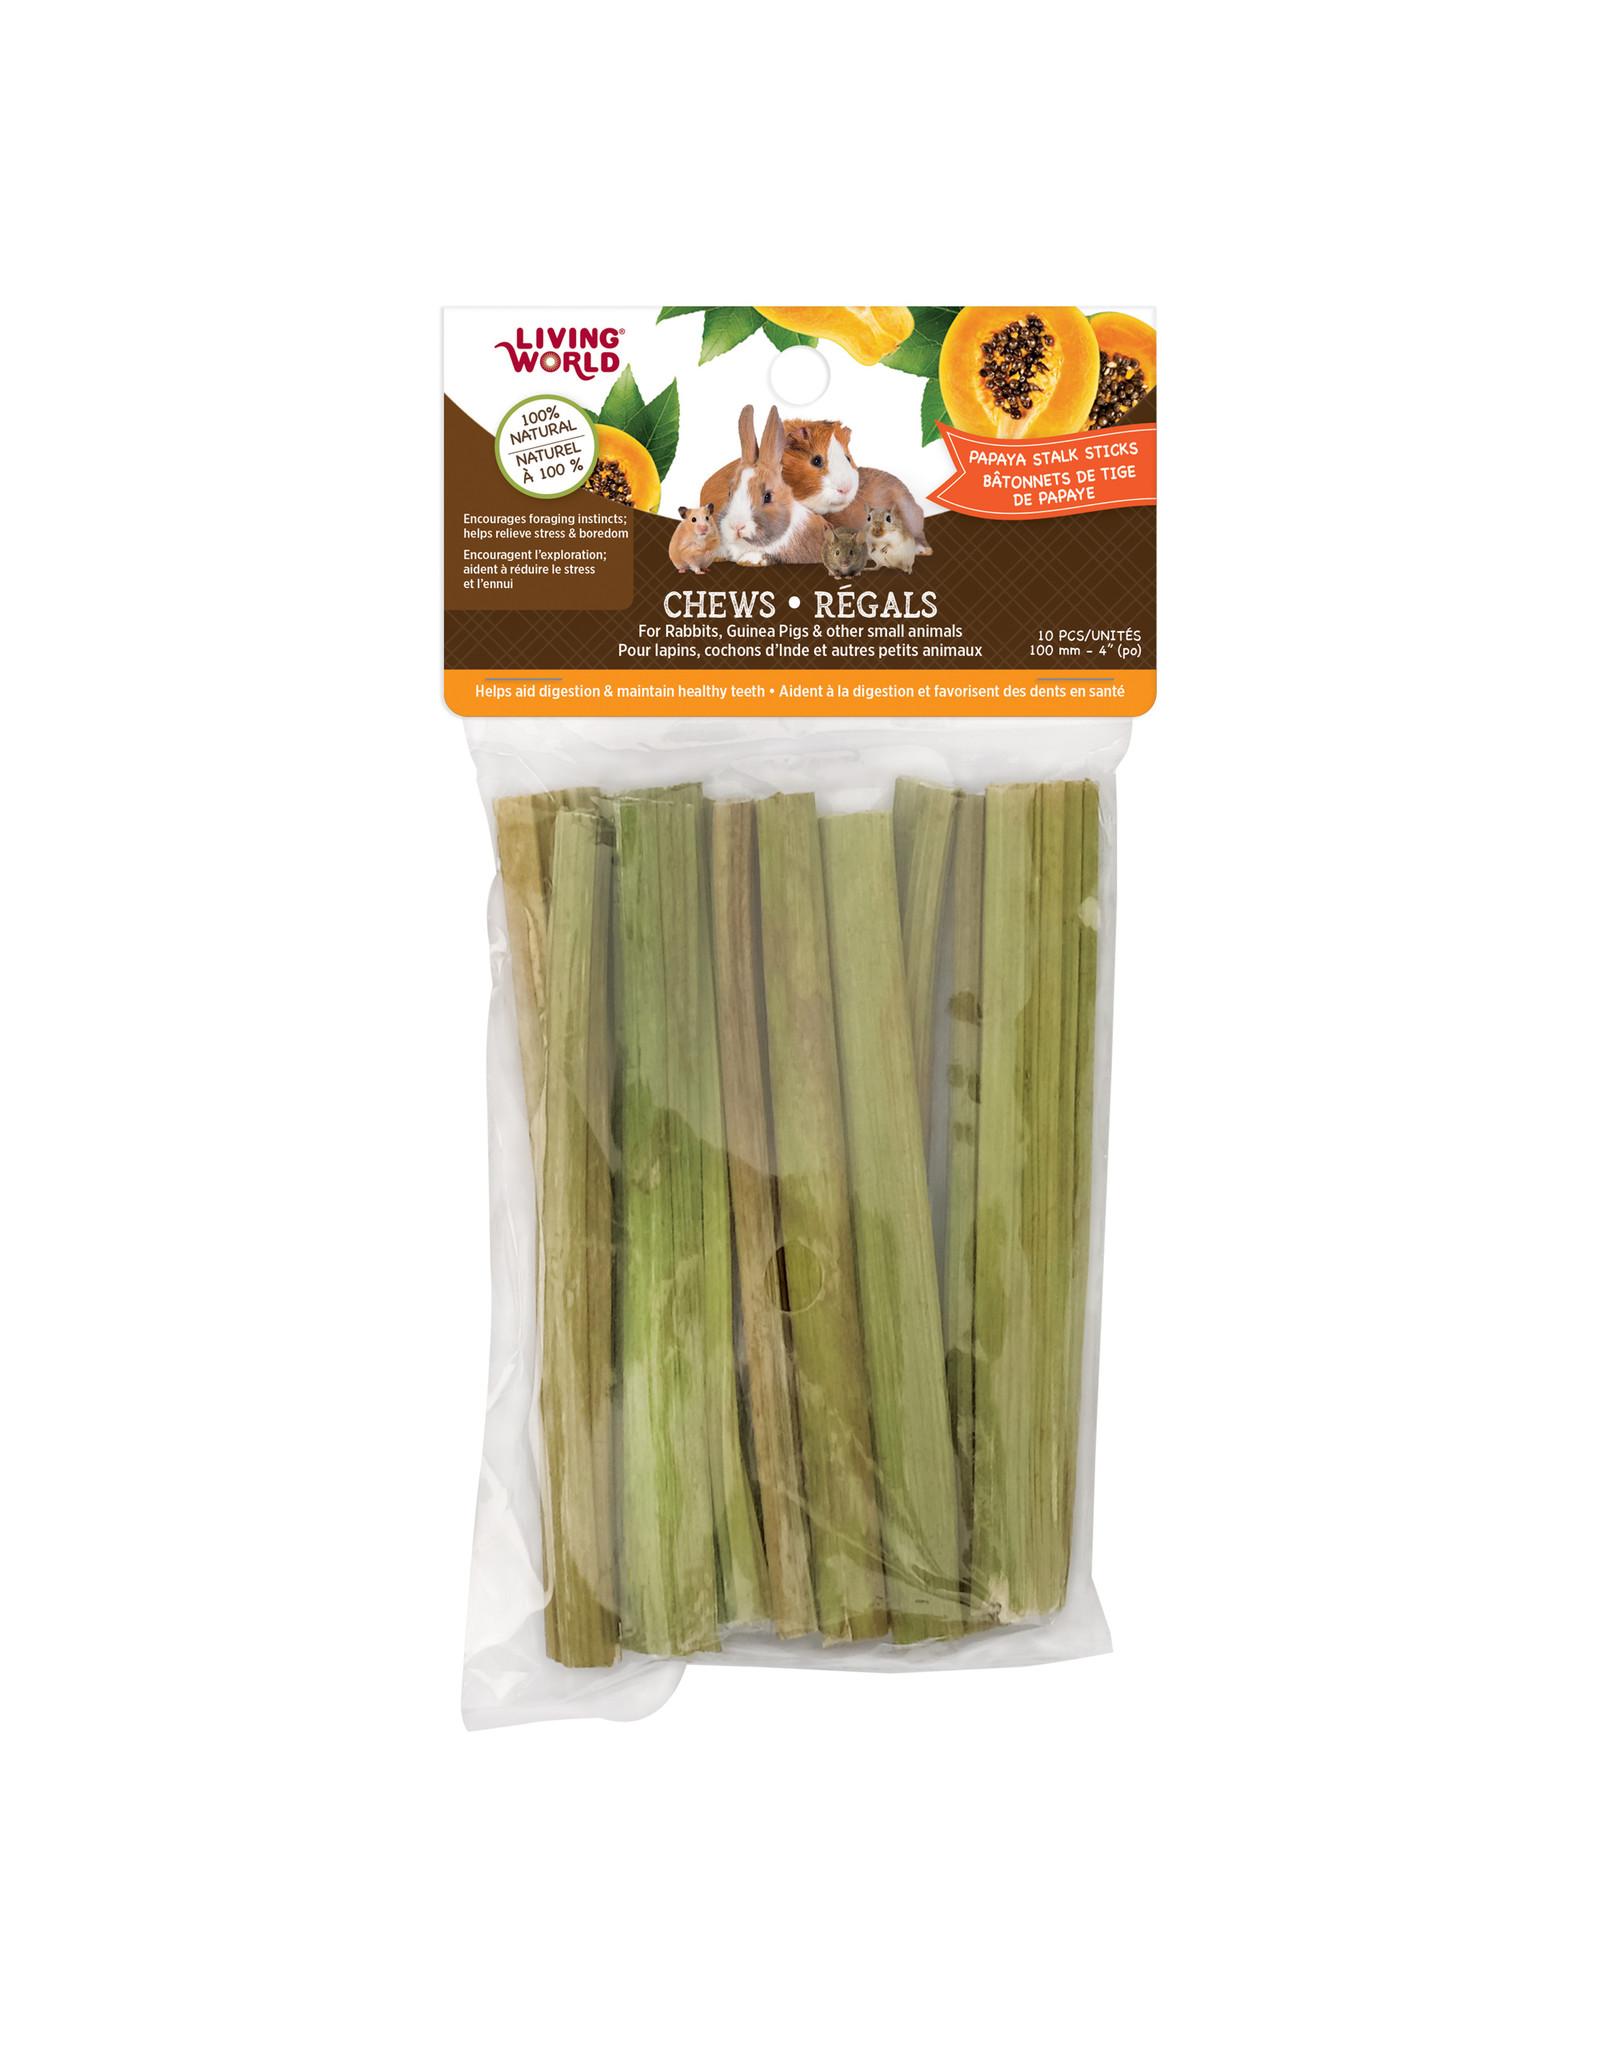 "Living World LIVING WORLD Small Animal Chews Papaya Stalk Sticks 4"" x 10pc"